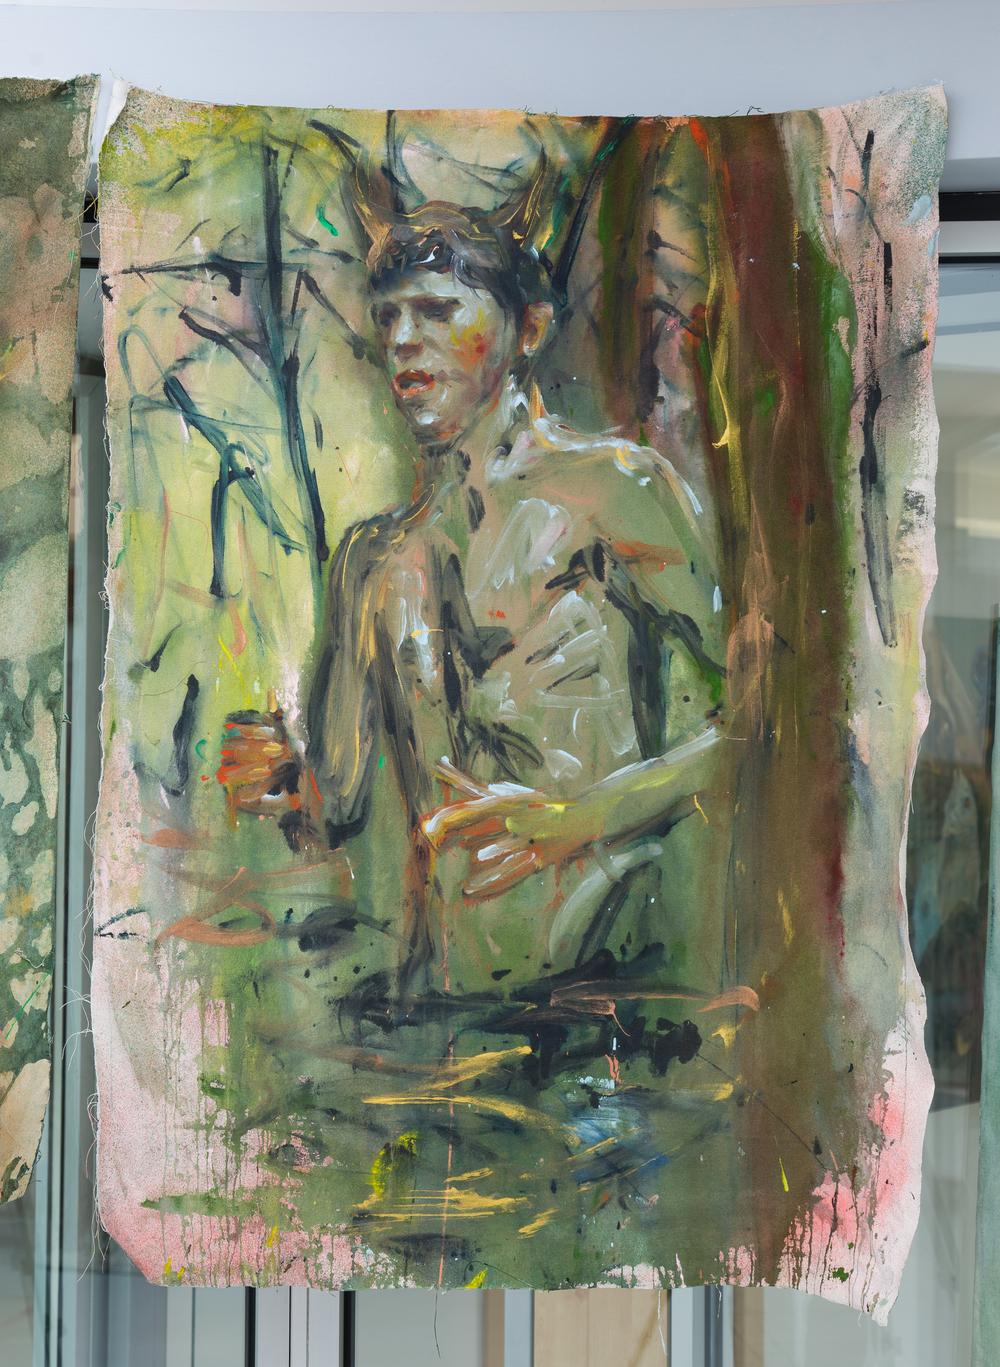 44. Andrej Dúbravský   močiar   2013, akryl na plátně   125 x 90 cm